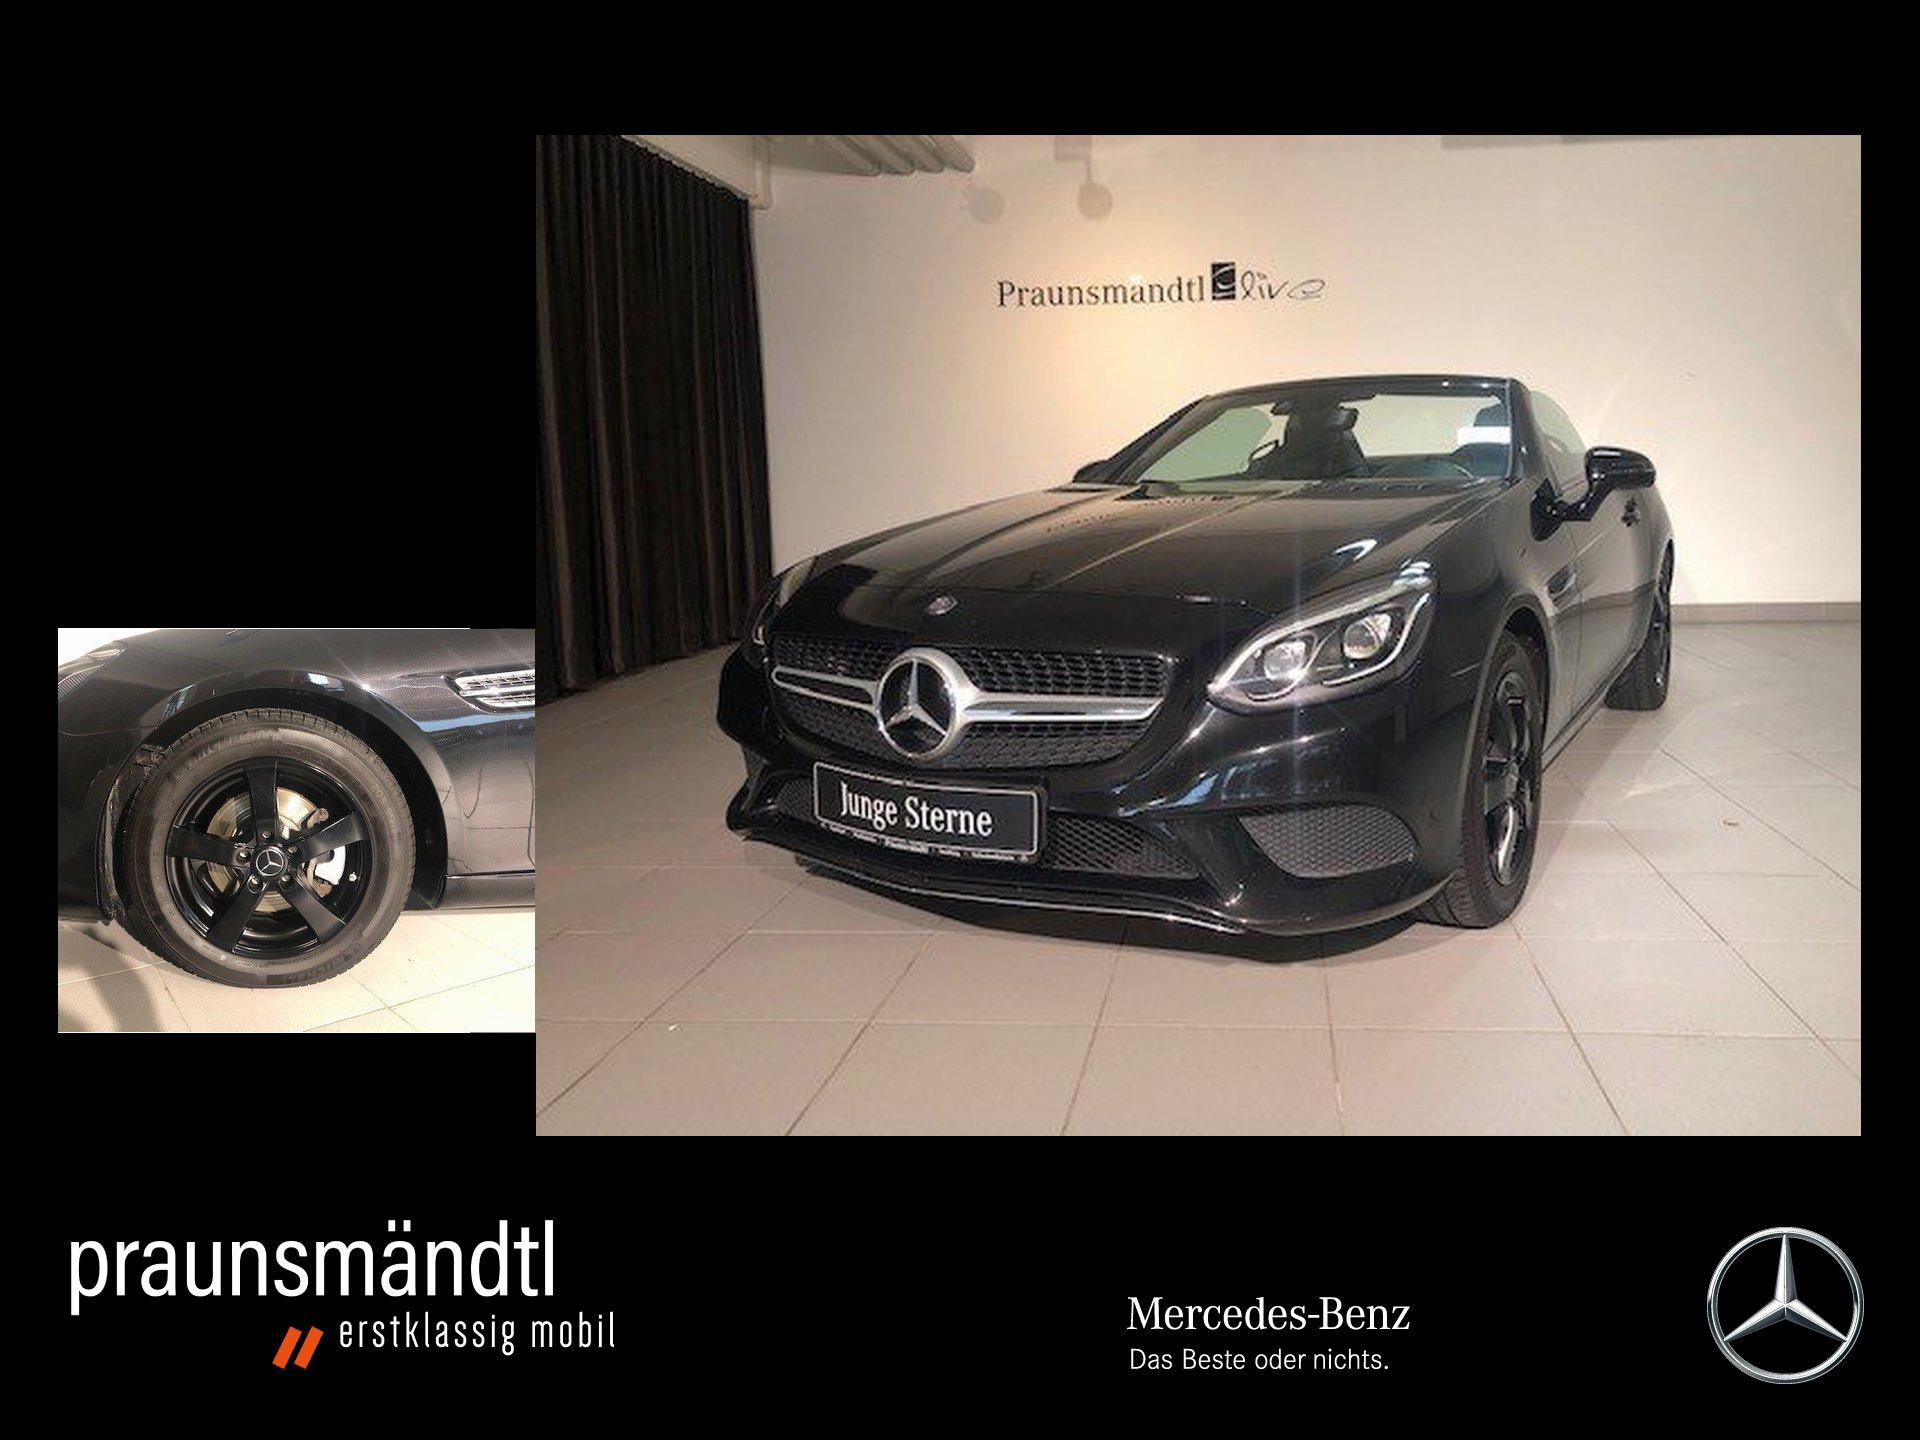 Mercedes-Benz SLC 180 9ATG/Navi/LED/SHZ/AIRSCARF/Pano/Leder, Jahr 2016, Benzin